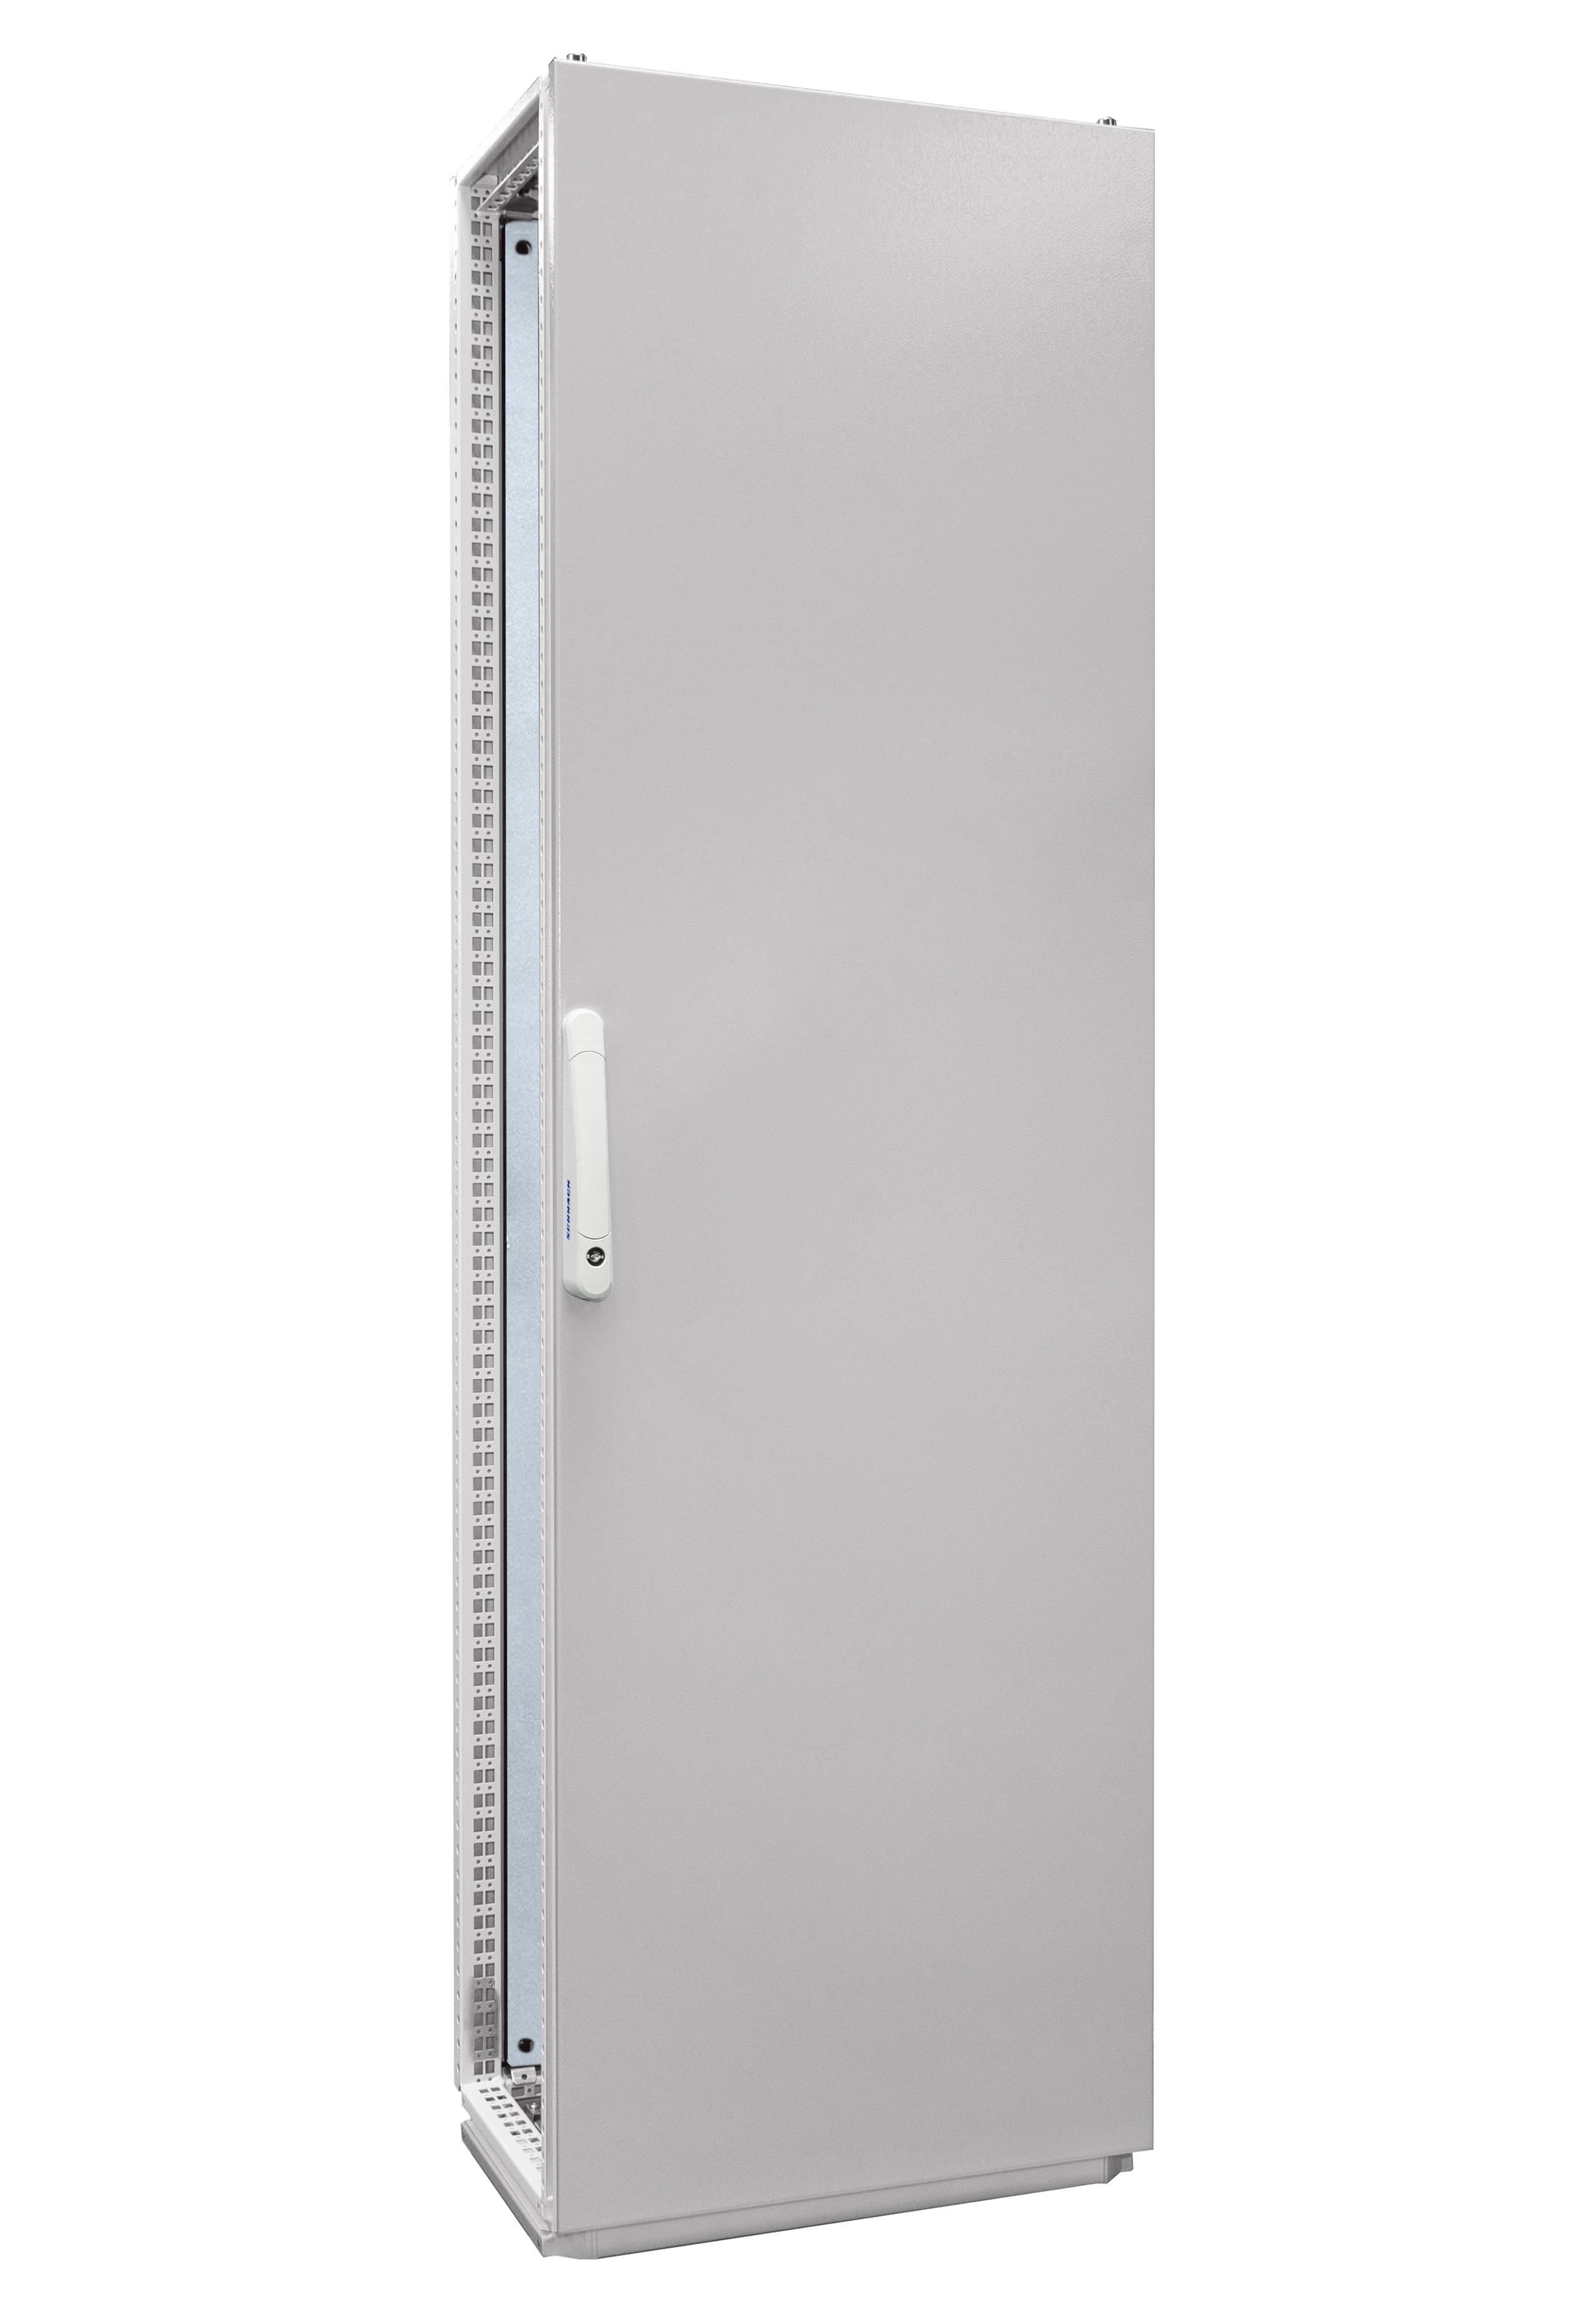 1 Stk Anreihschrank 1-Tür IP55 H=2000 B=600 T=400mm Stahlblech AC206040--